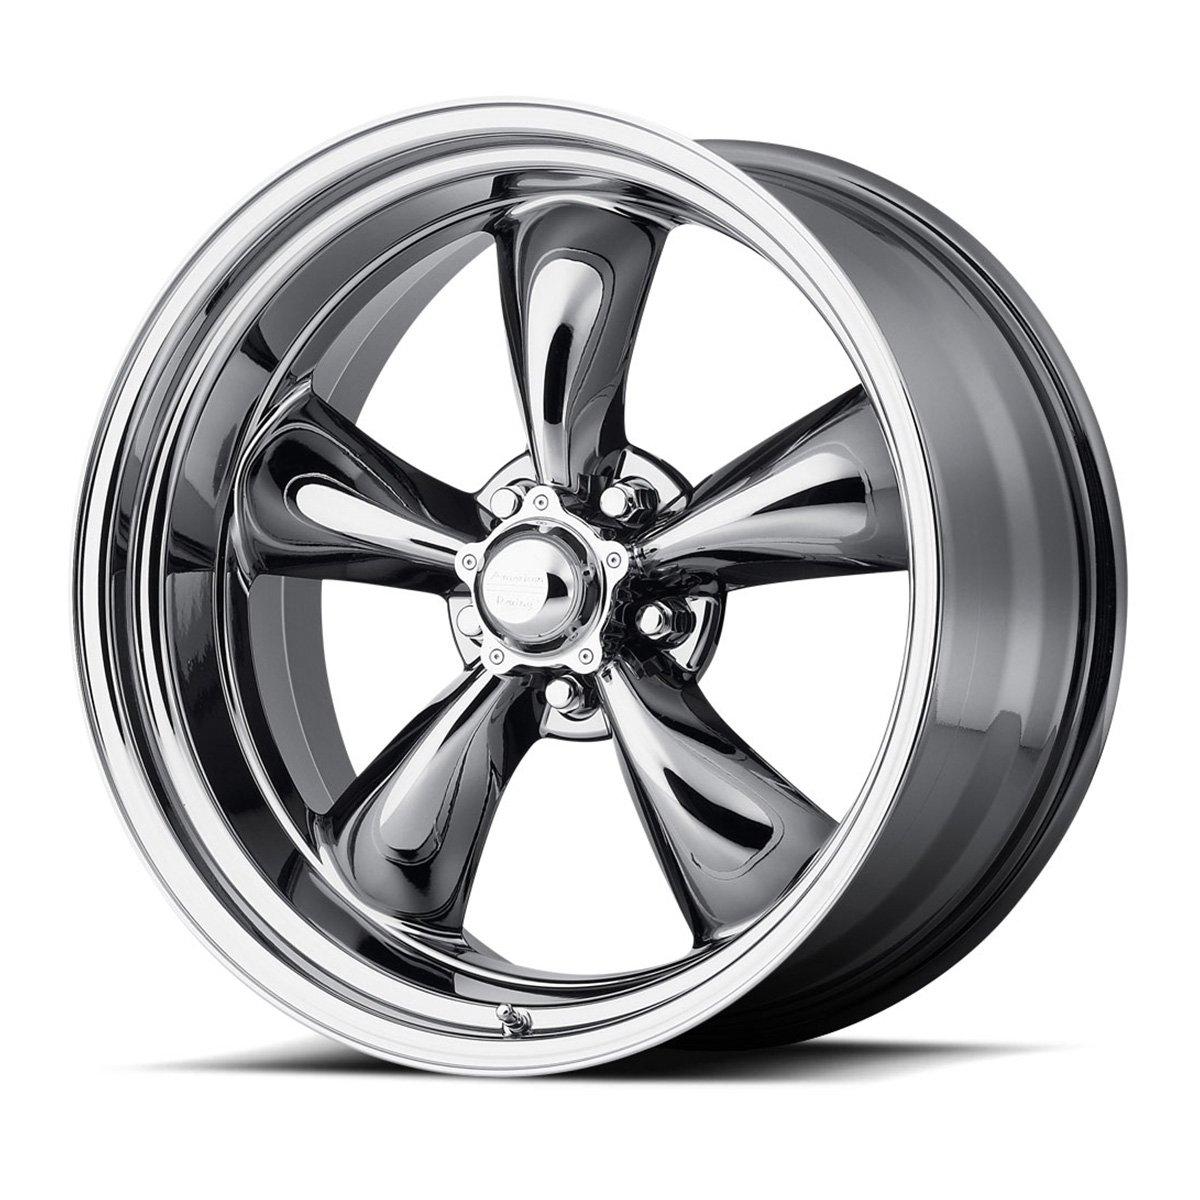 American Racing VN815 Torq Thrust II 1-Piece PVD Wheel (18x9''/5x120.7mm, 00mm offset)